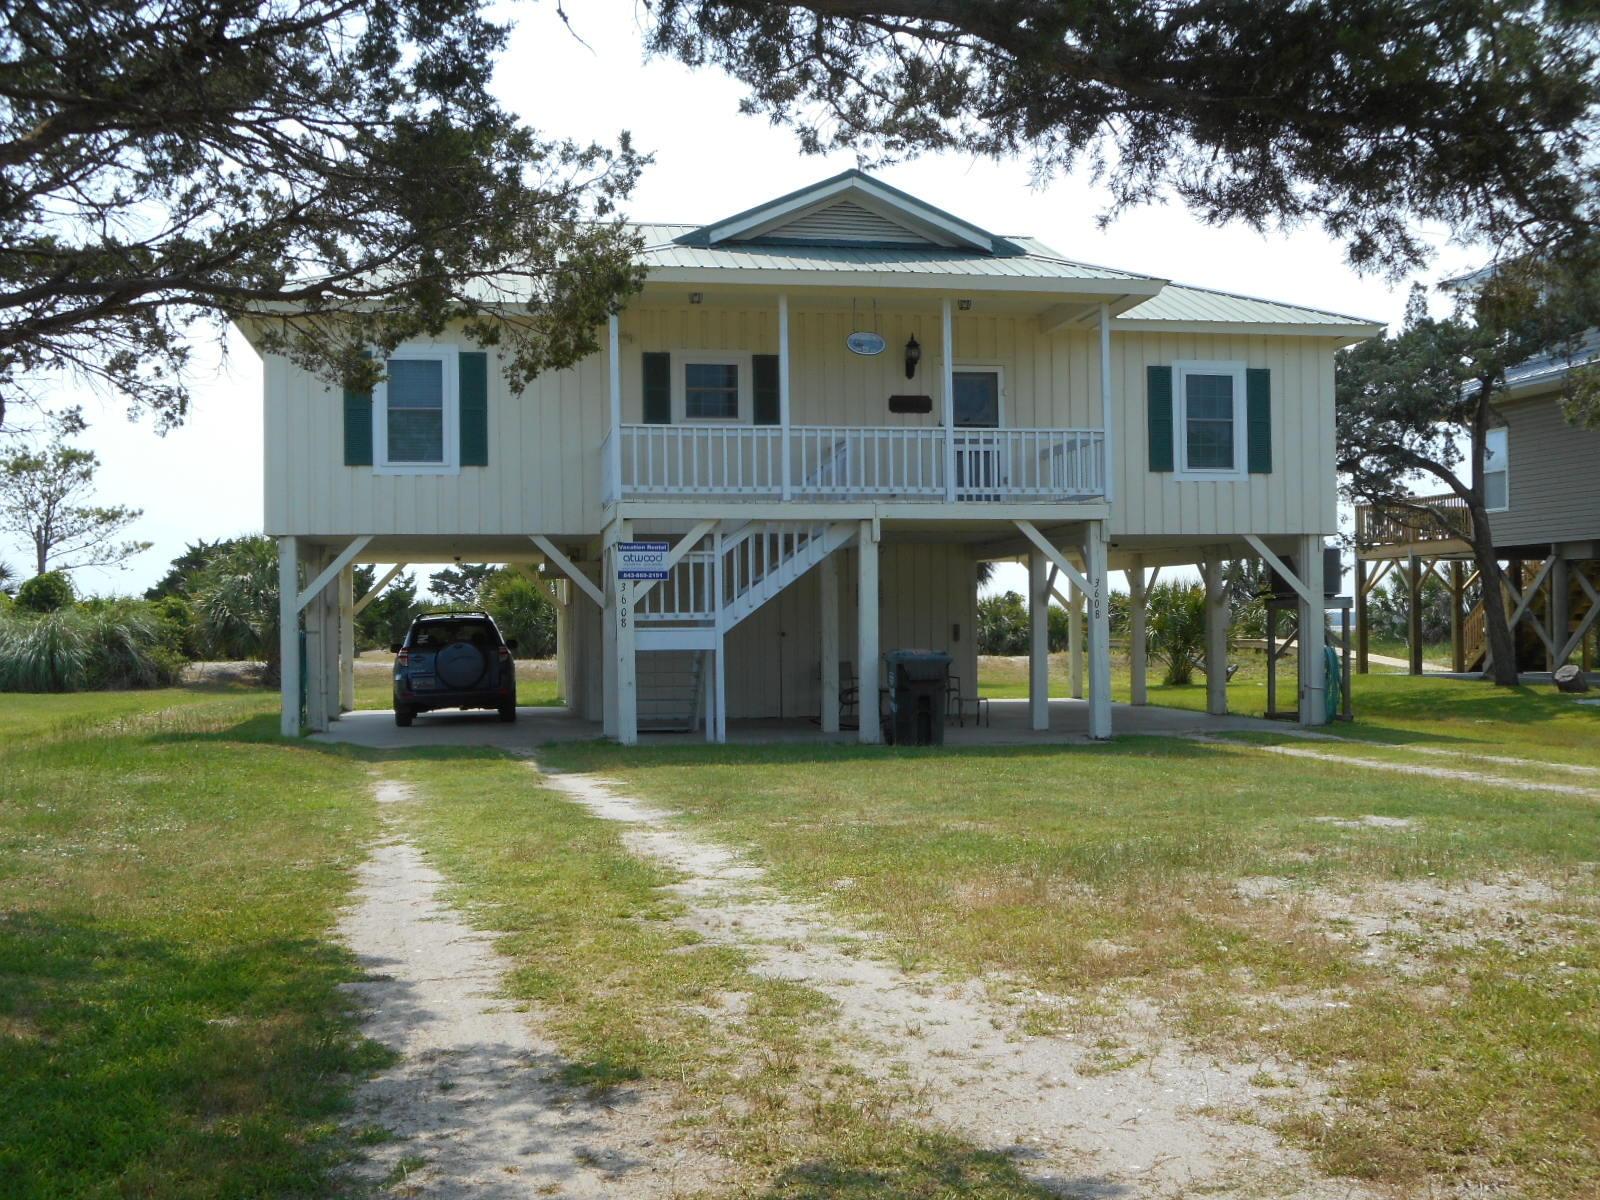 Beachfront Homes For Sale - 3608 Yacht Club, Edisto Beach, SC - 2